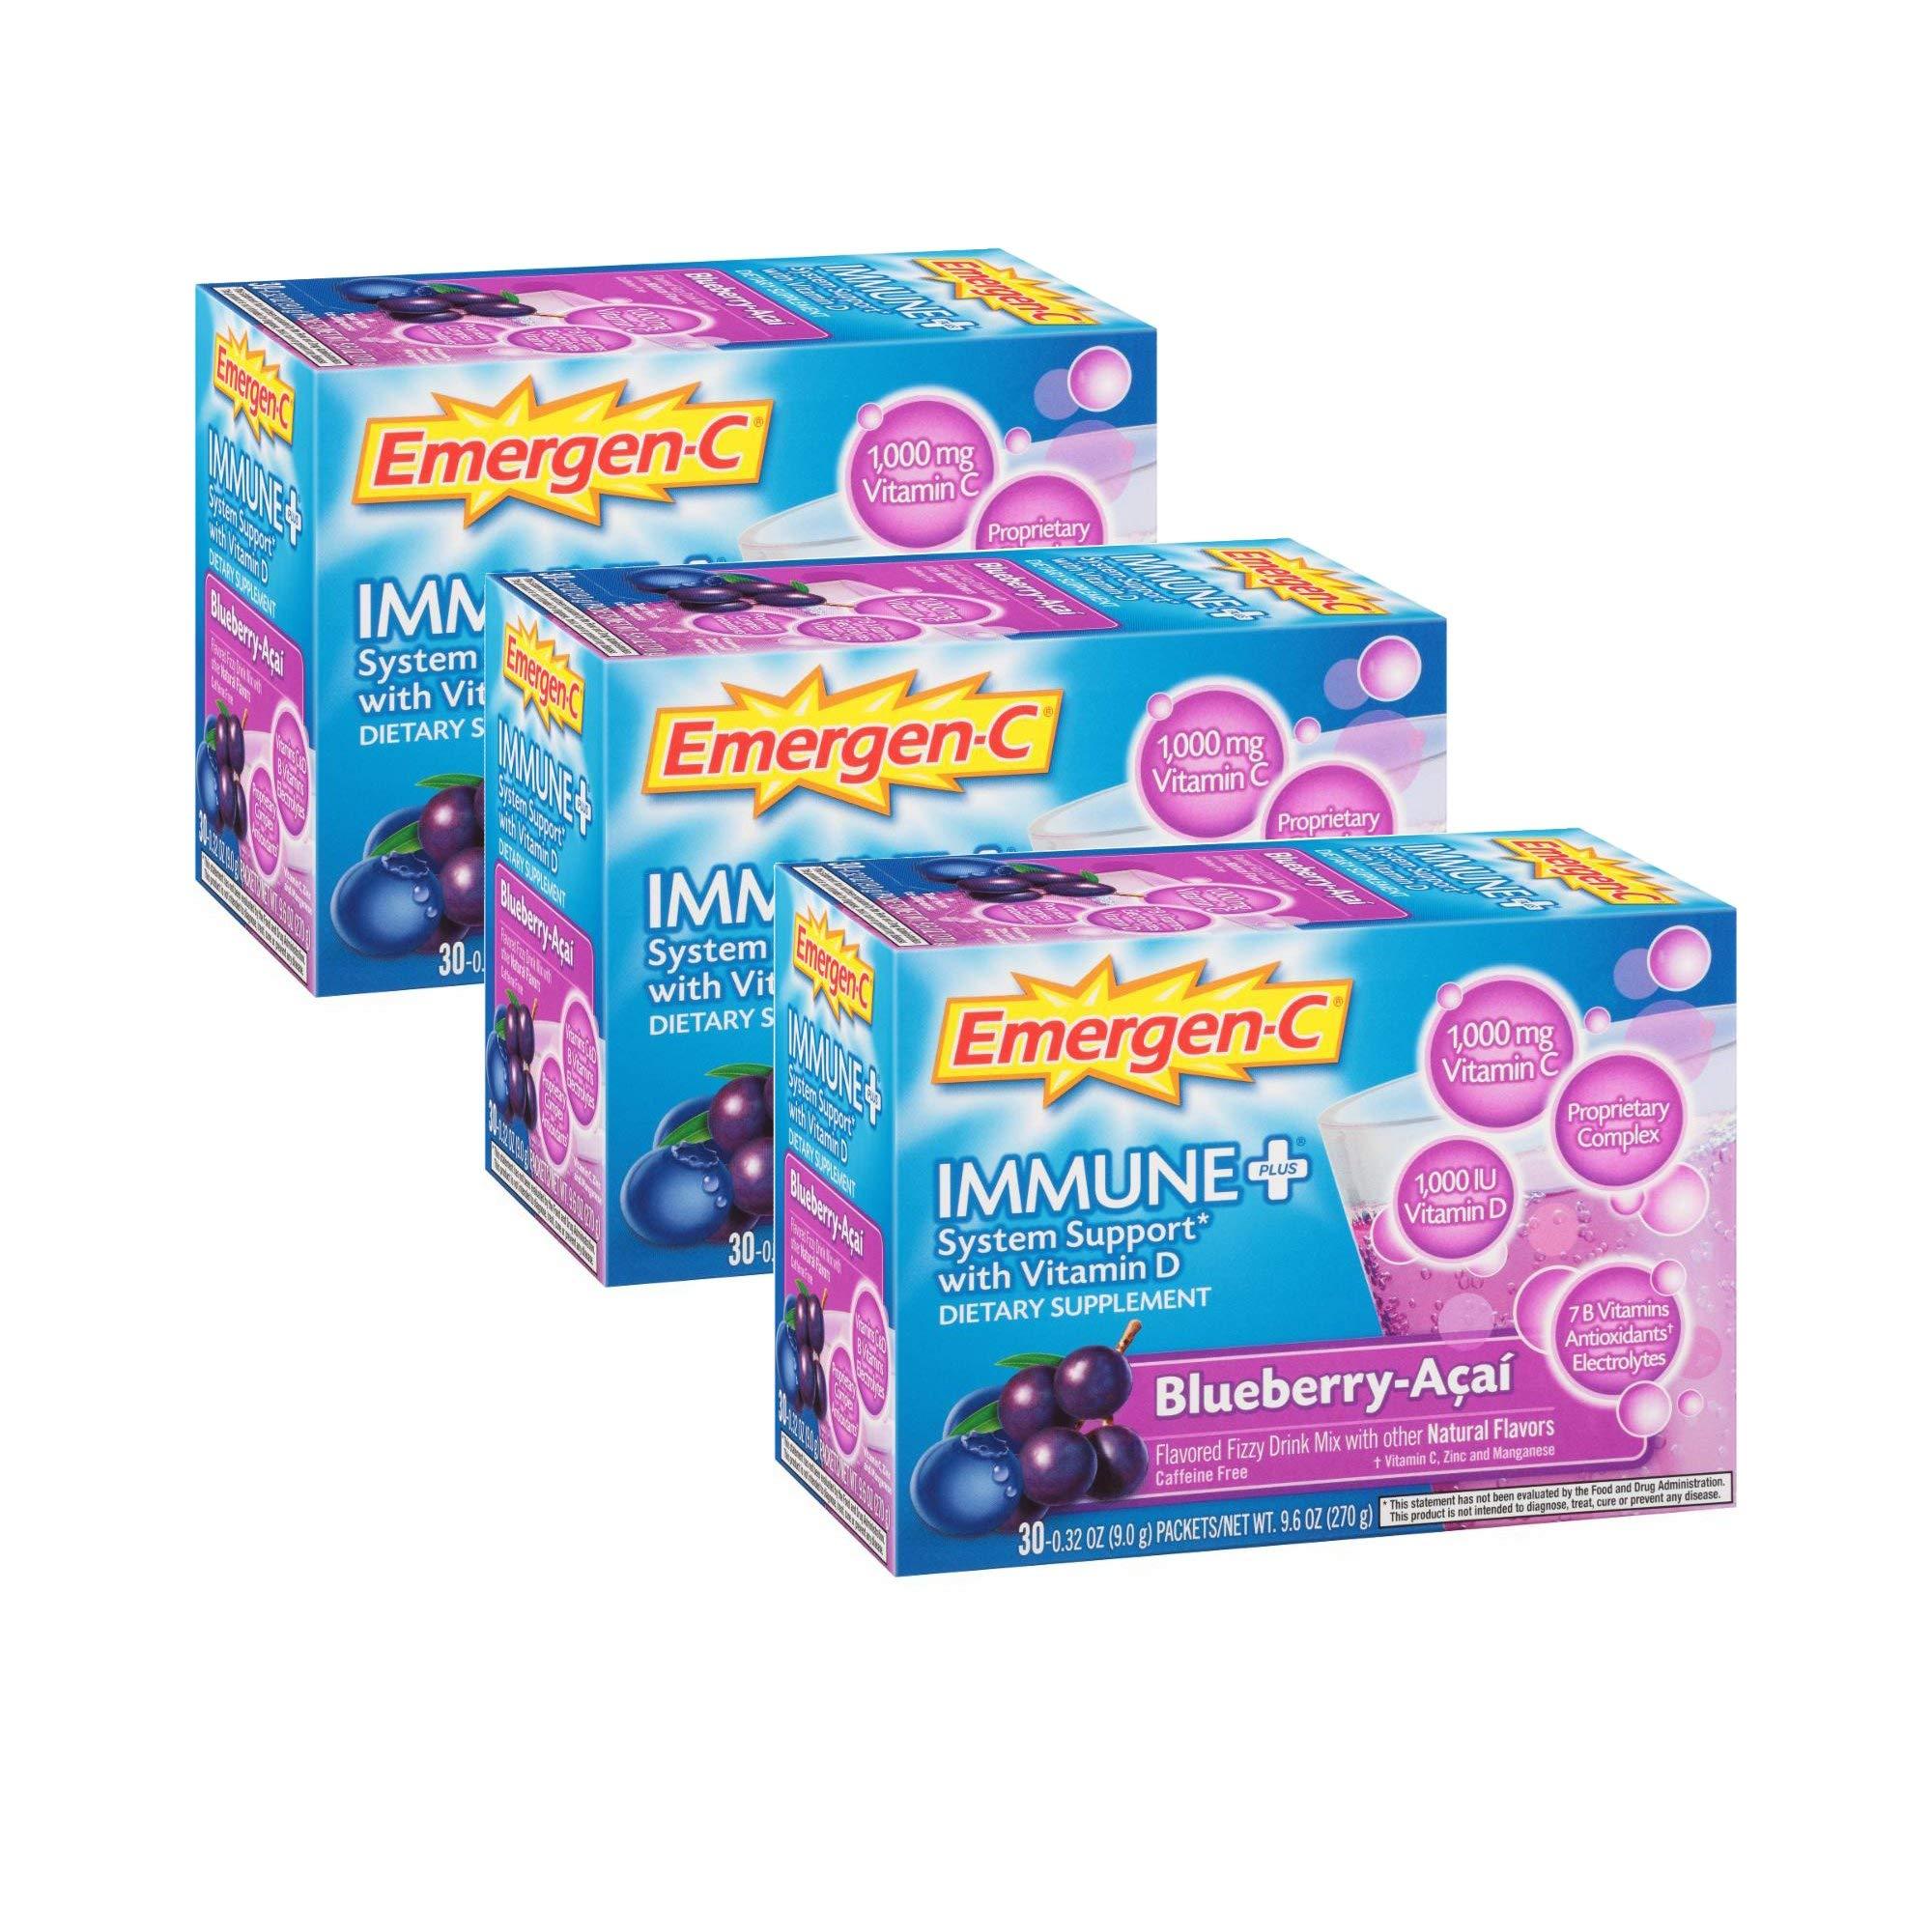 c5355bfa216 Emergen-C Immune System Support Dietary Supplement Fizzy Drink Mix With Vitamin  D